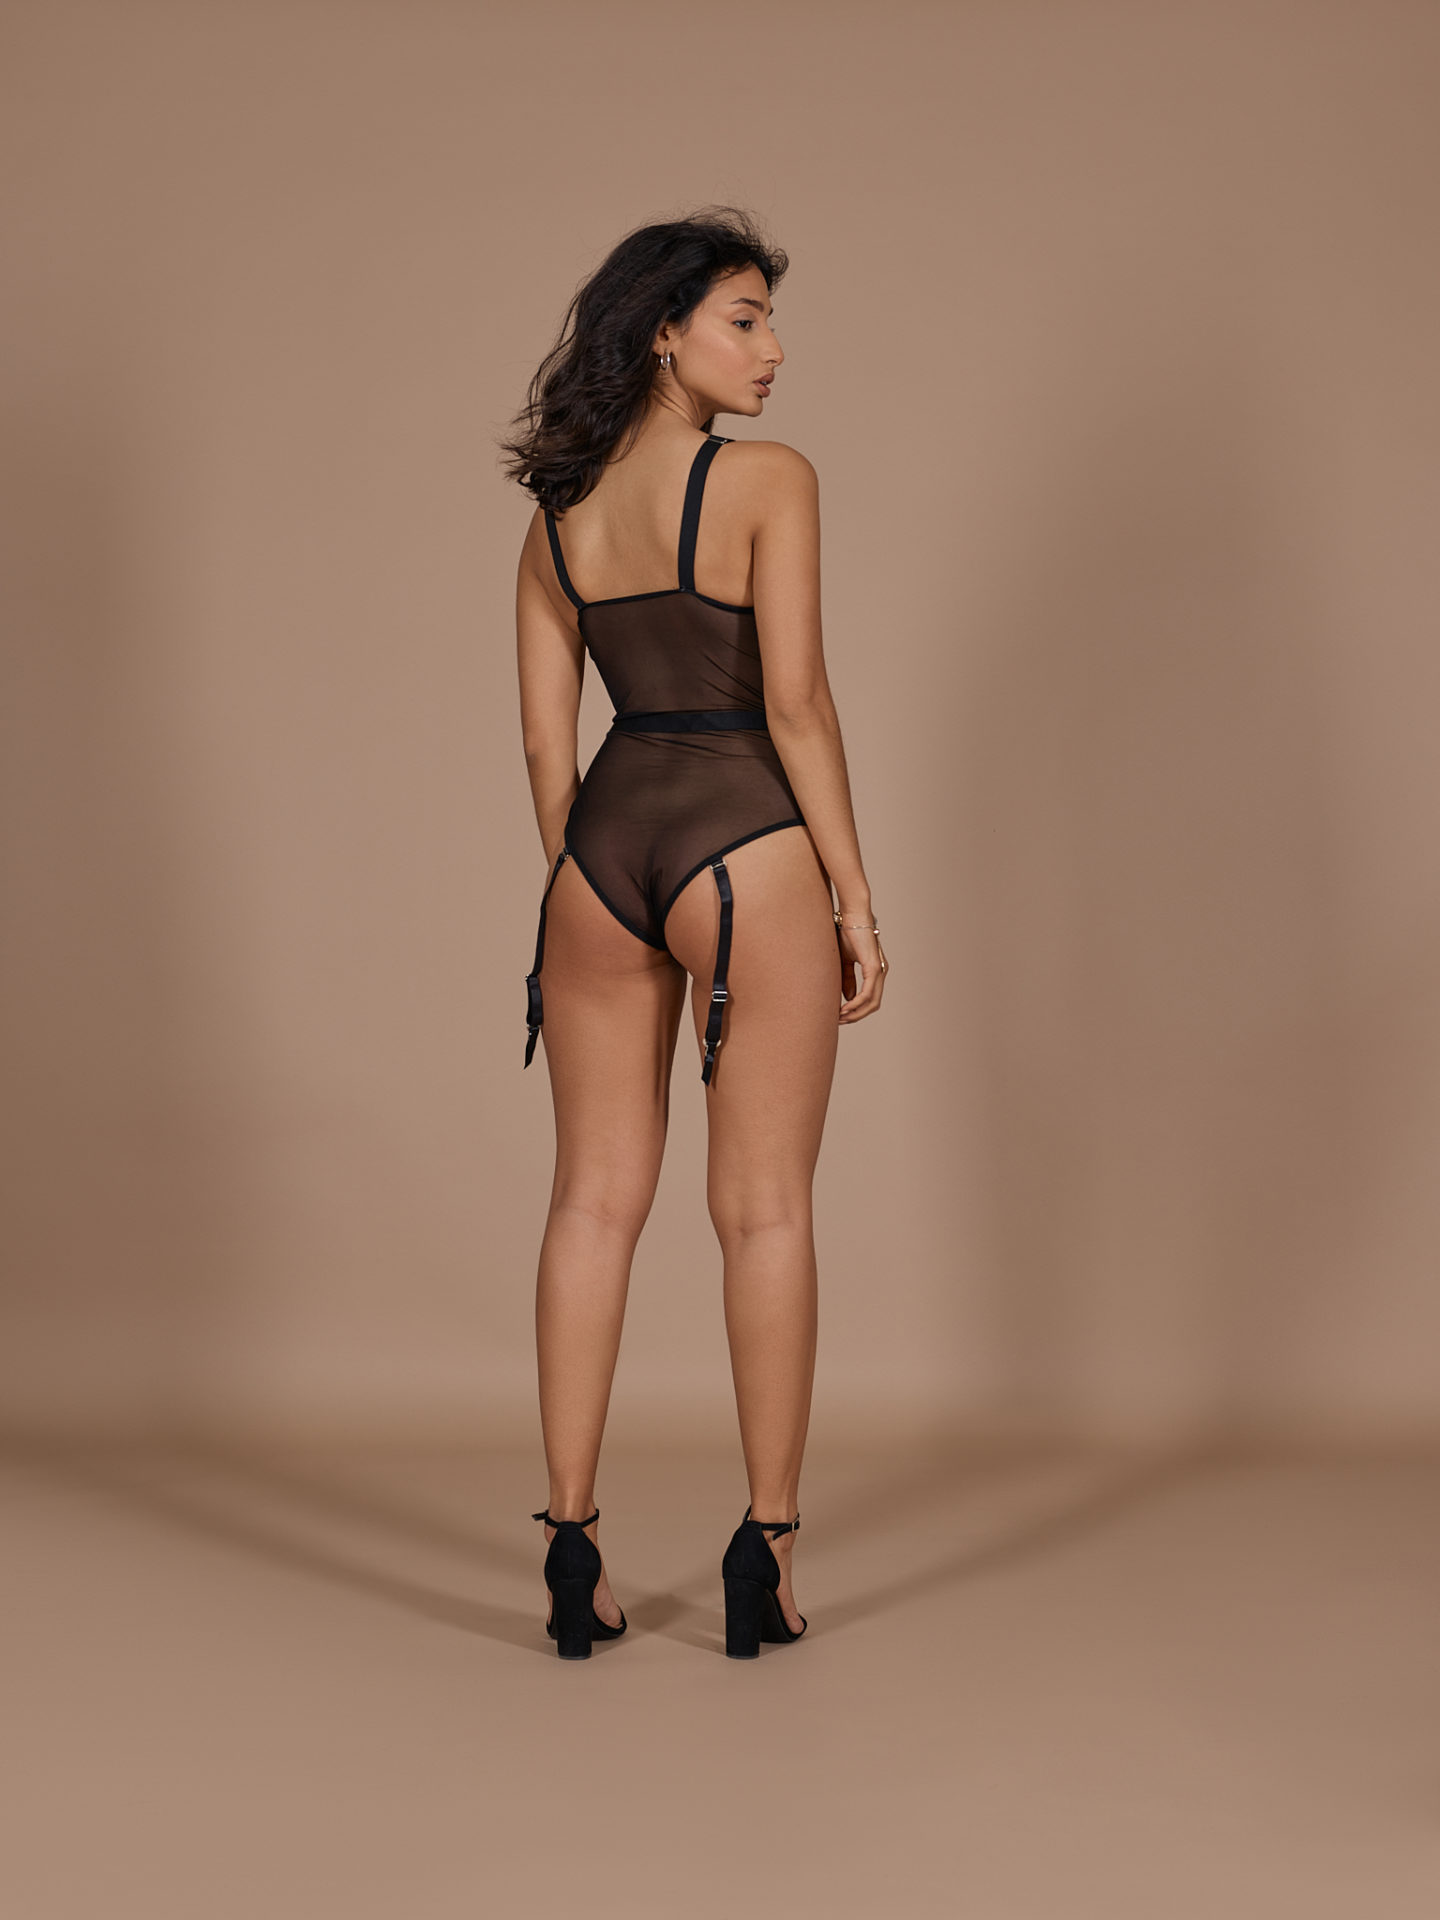 Shooting catalogue lingerie